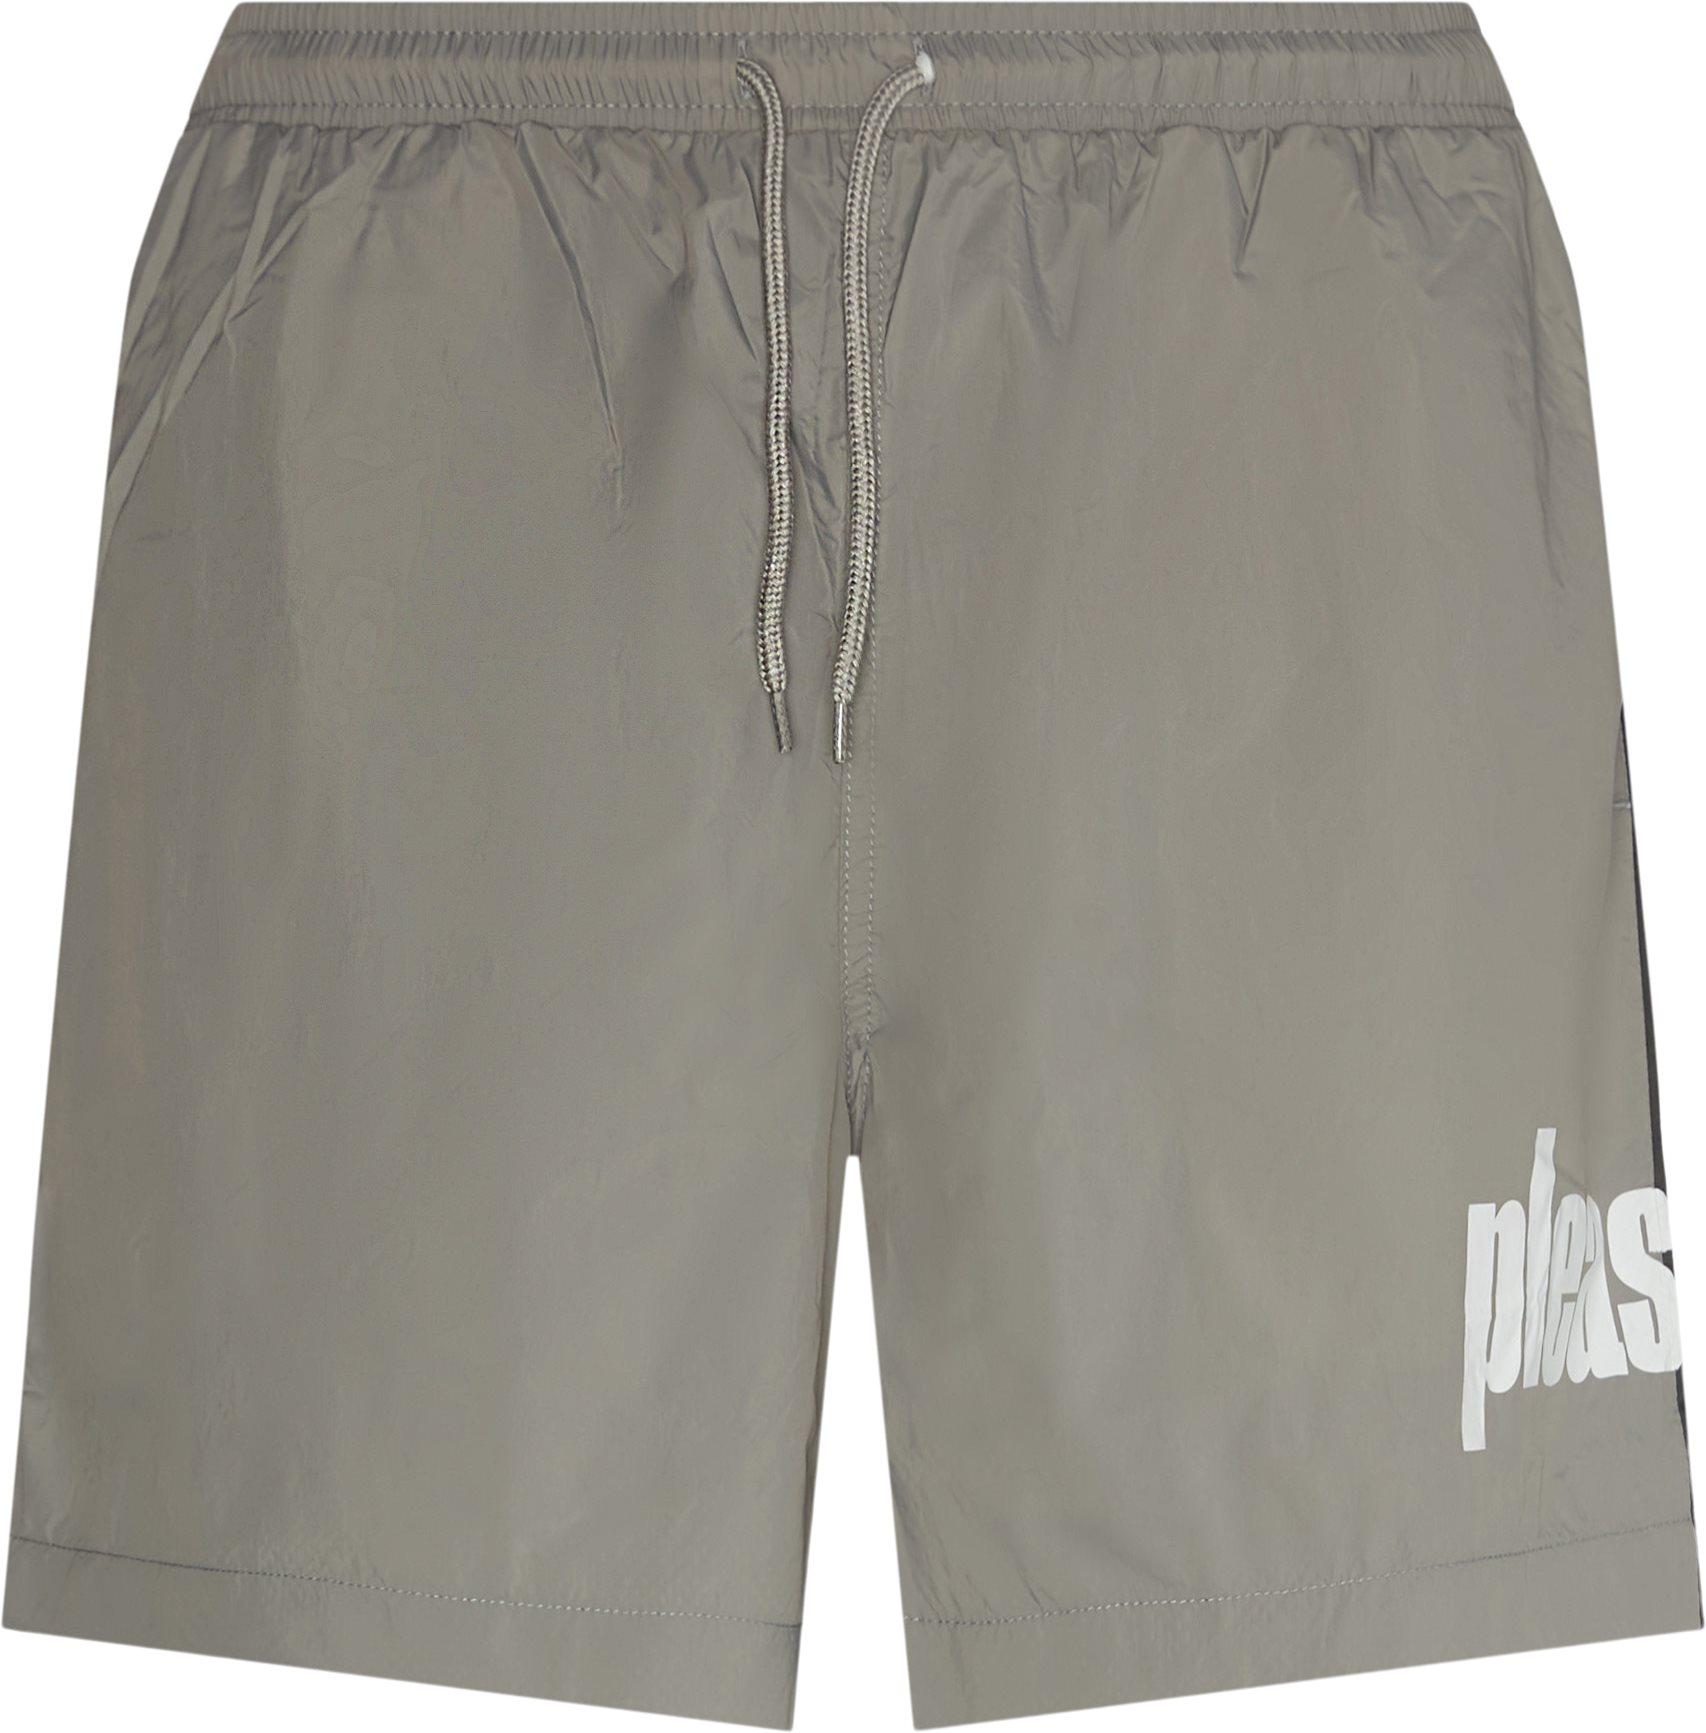 Electric Active Shorts - Shorts - Regular fit - Sort